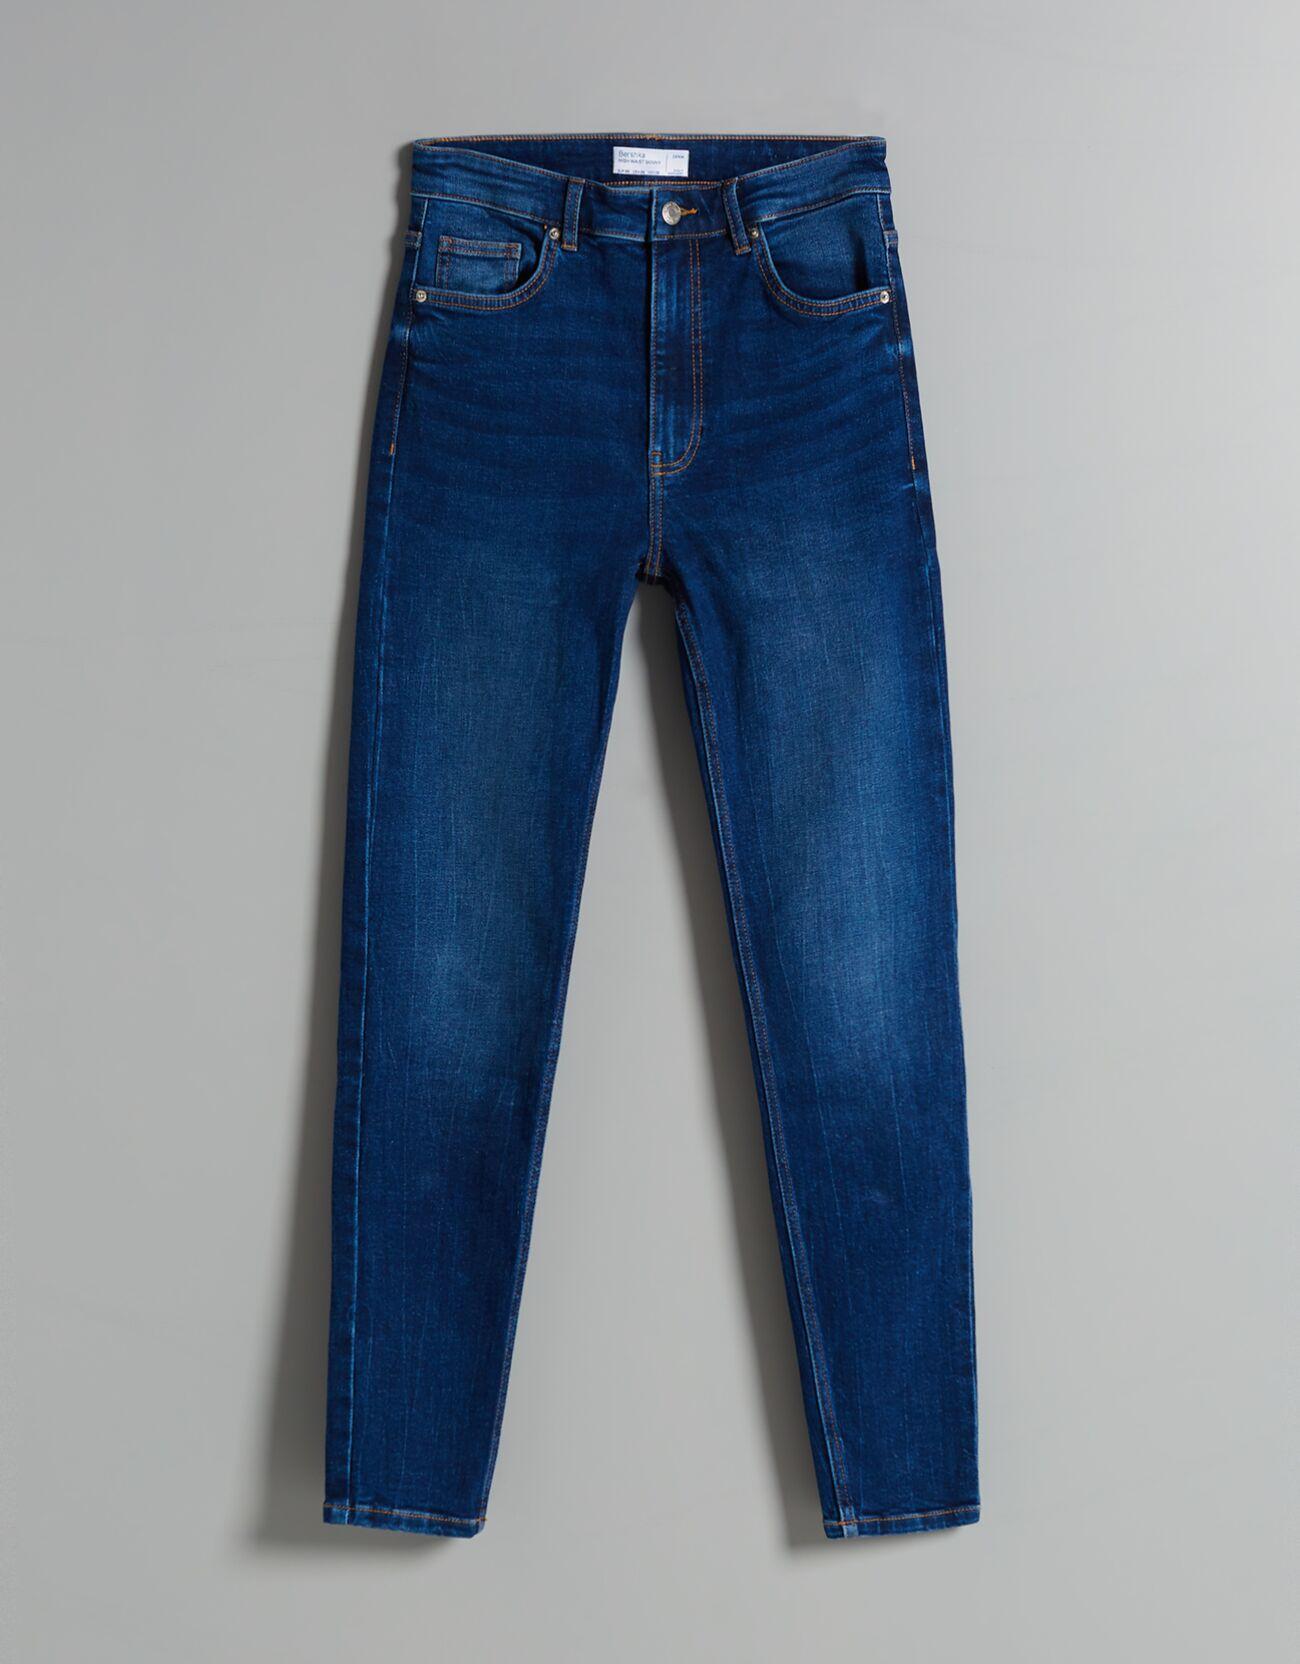 Jeans skinny high waist.